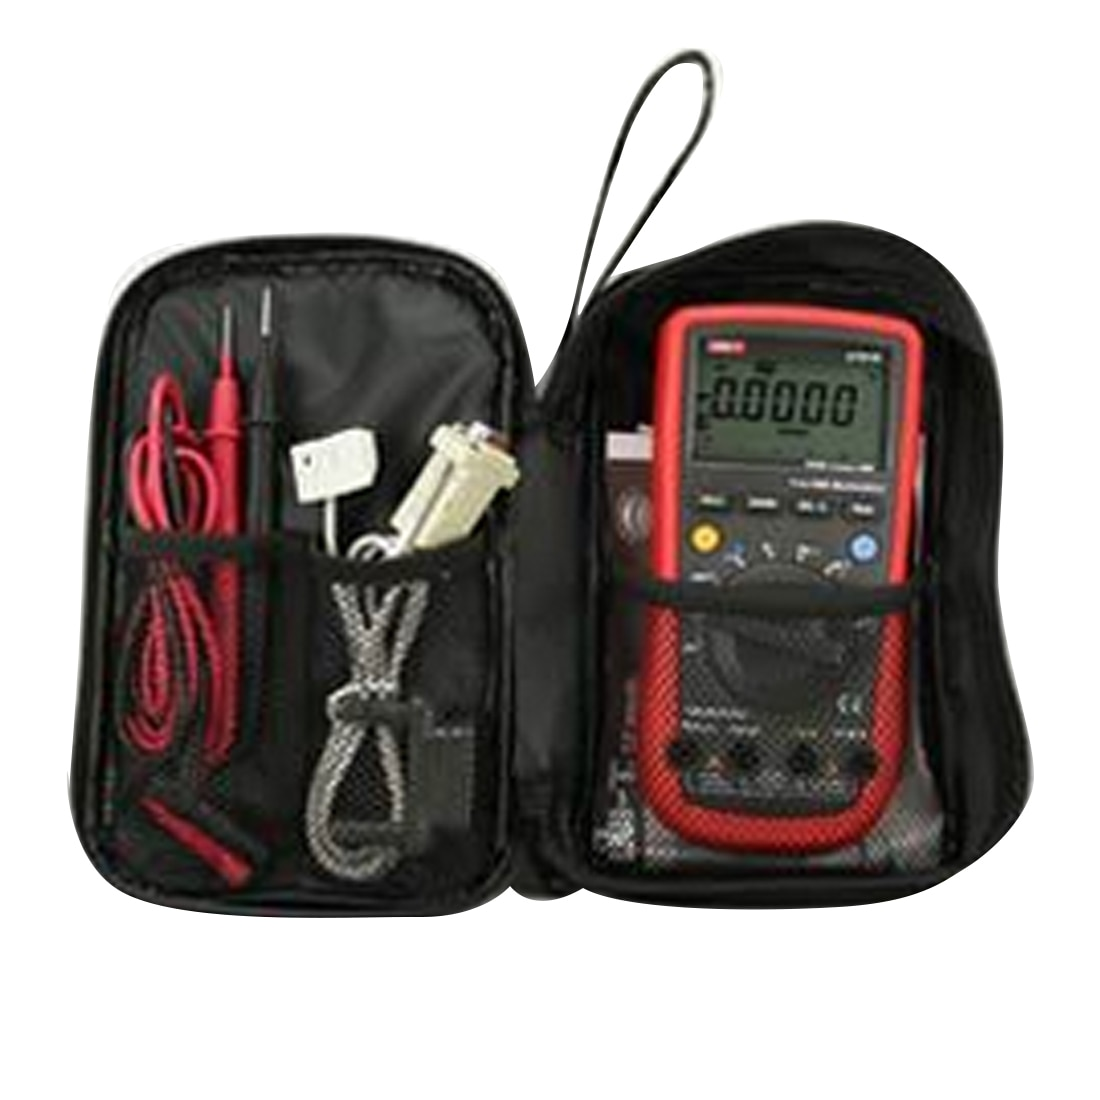 Bolsa de herramientas a prueba de agua multímetro duradero, bolsa de lona negra para tela multímetro Digital serie UT61 20*12*4cm